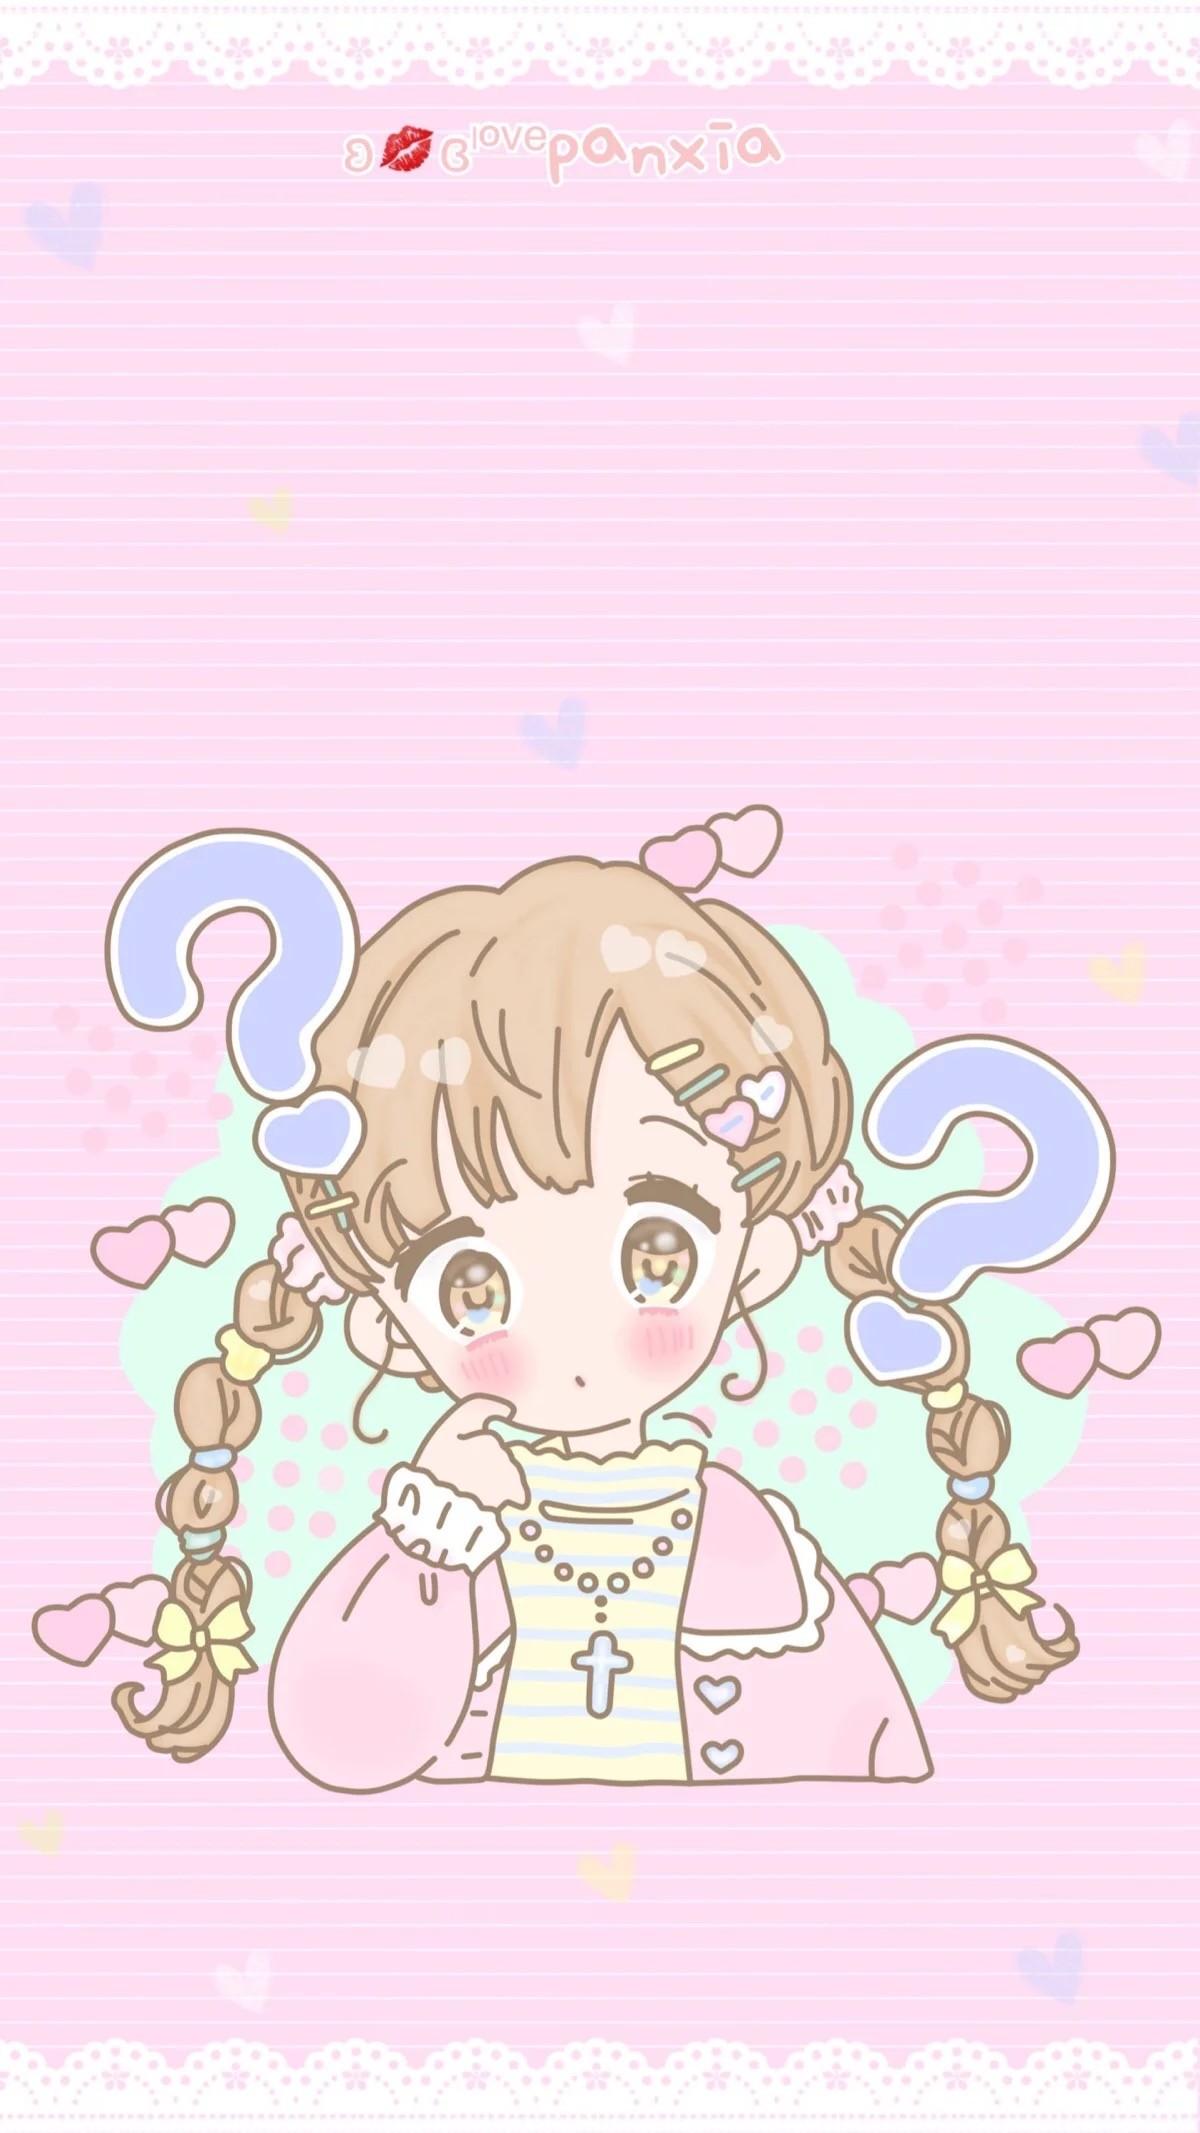 X Pastel Walls Kitty Wallpaper Phone Wallpapers Hello Kitty Kawaii Glitter Girly Dots Screen